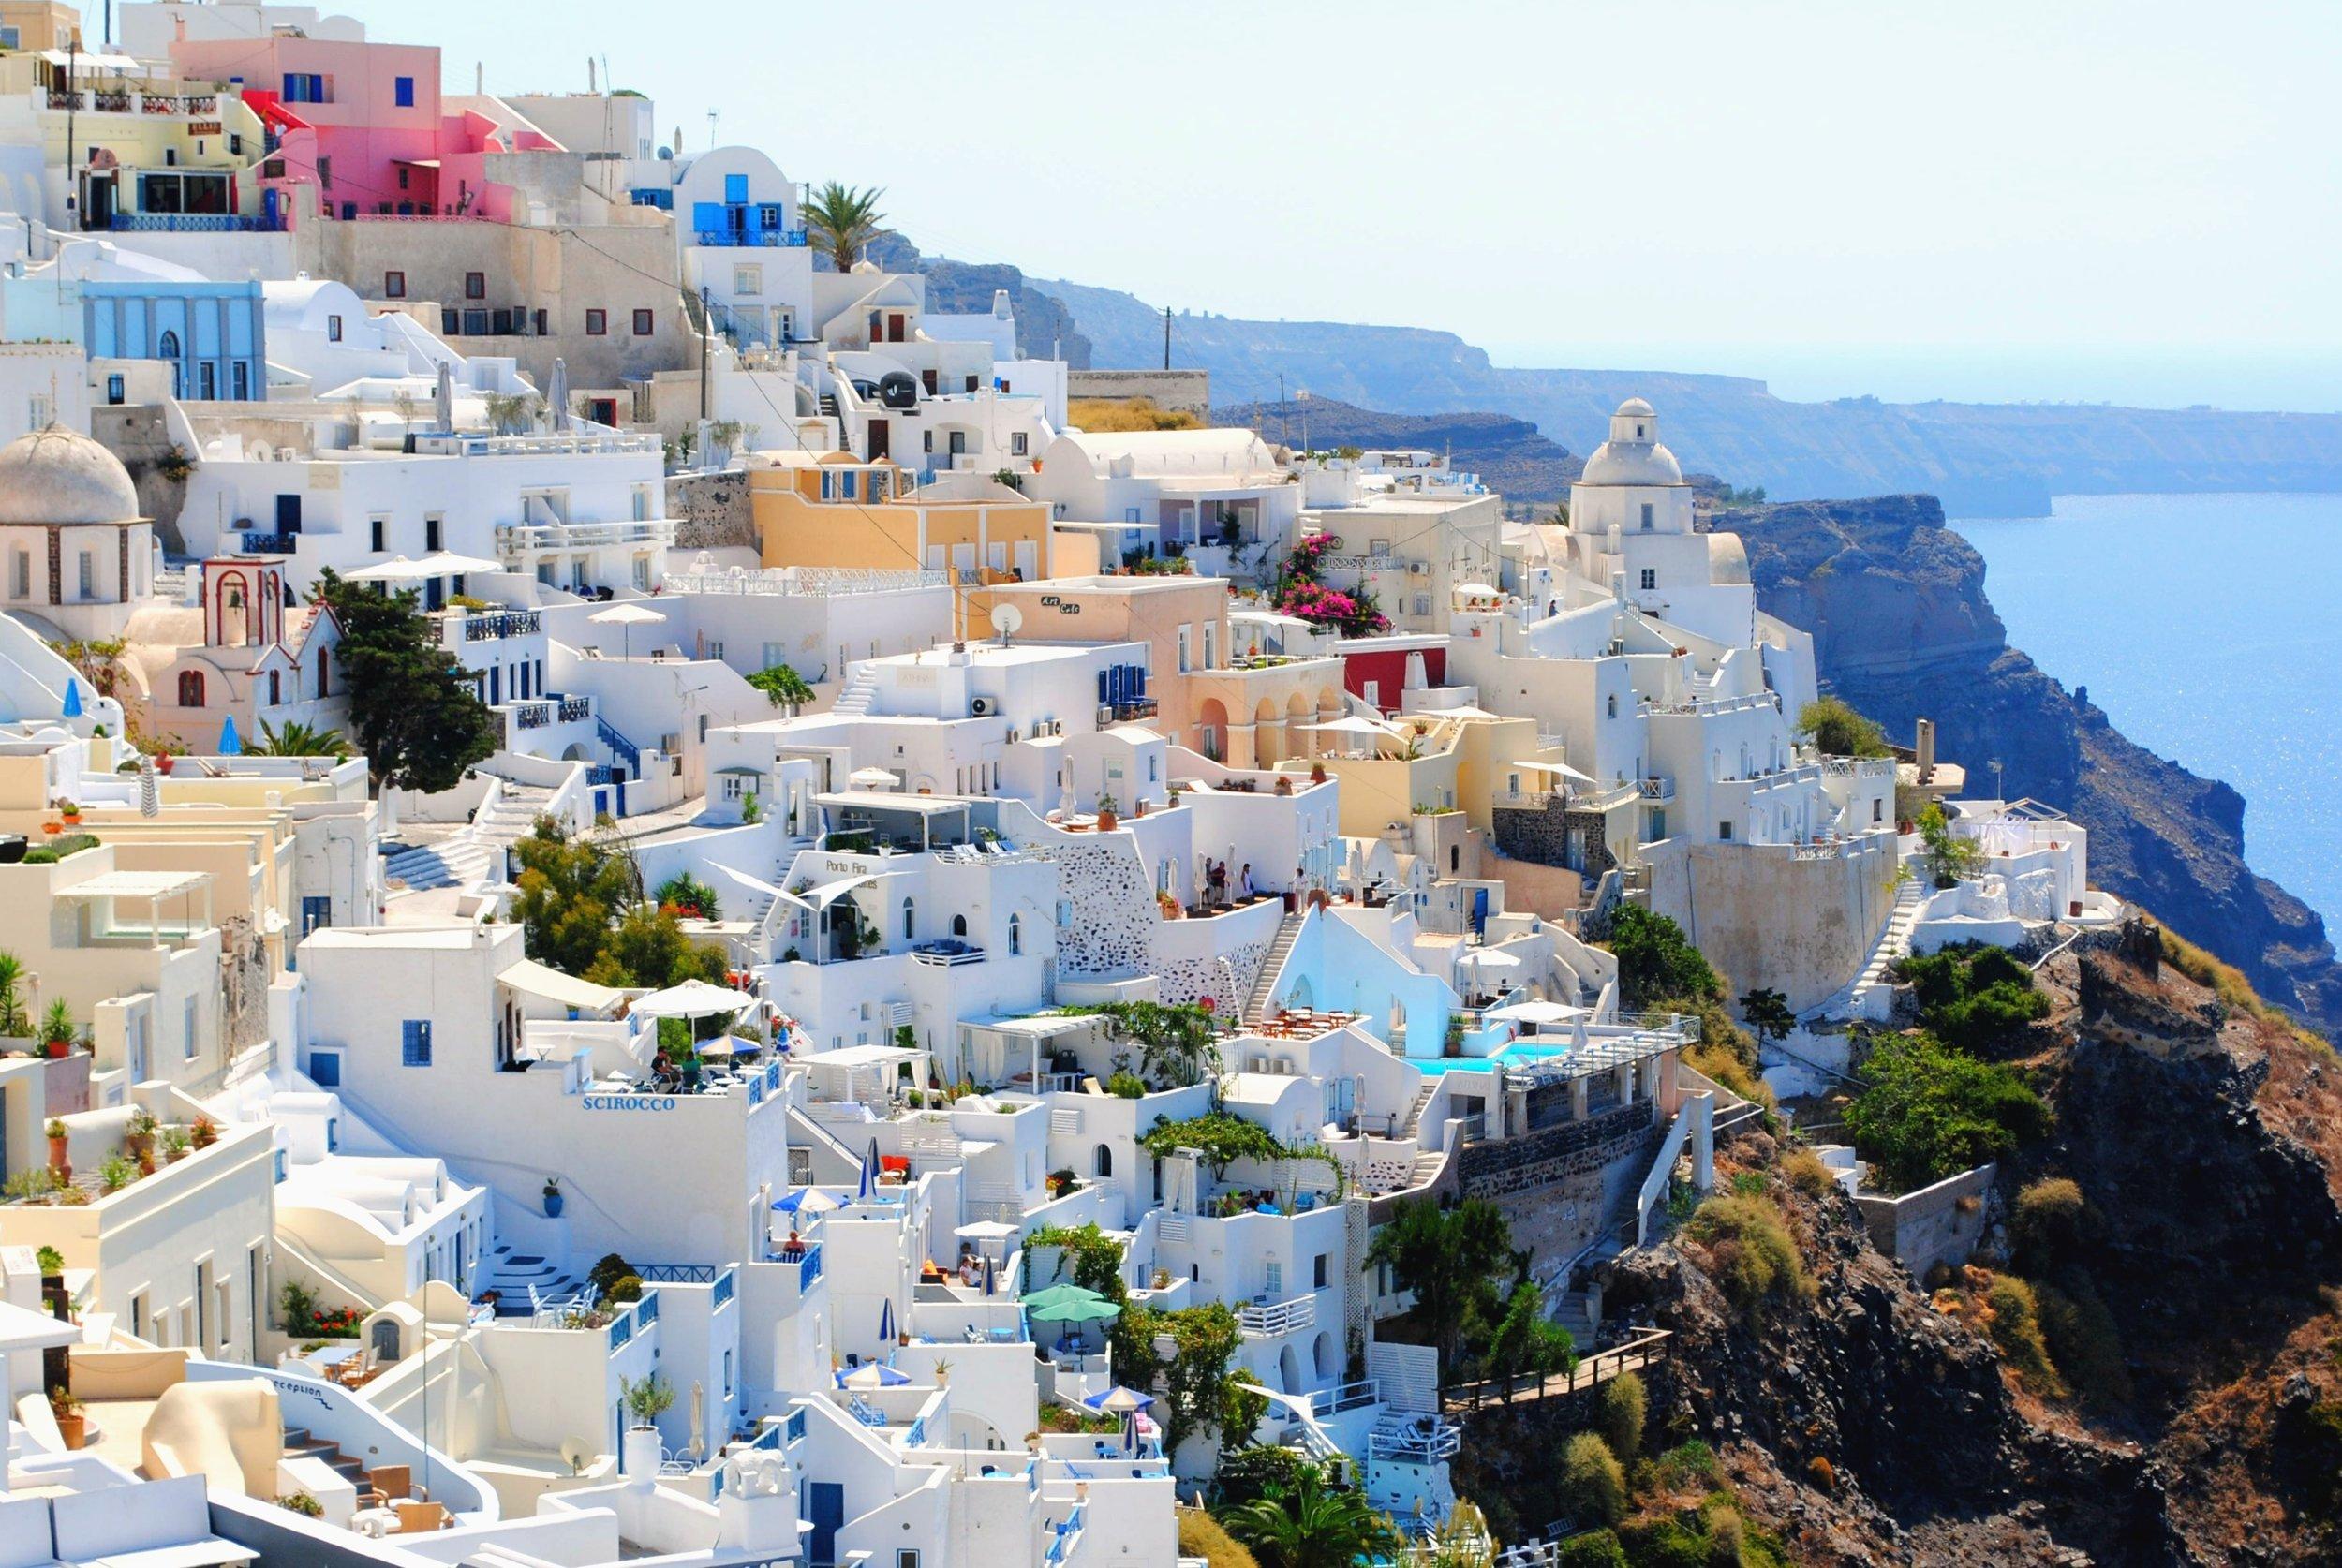 santorini-travel-holidays-vacation-161275.jpeg